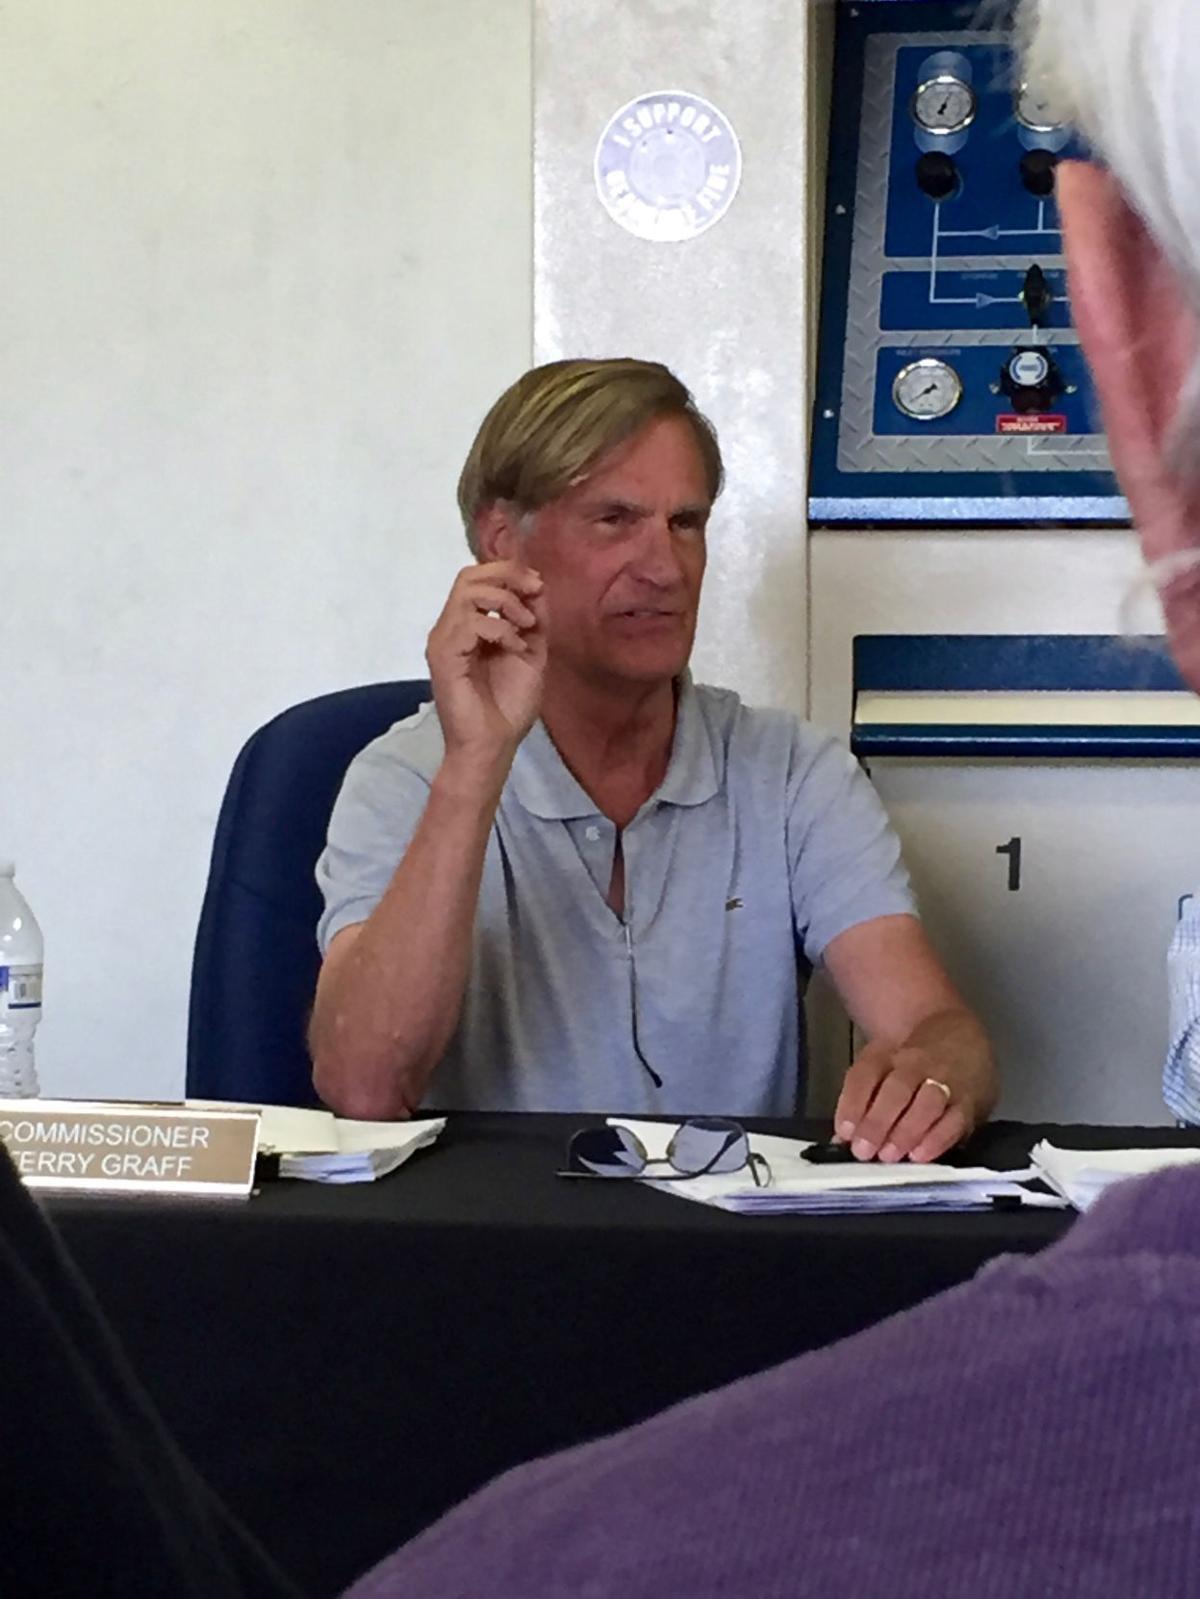 Gearhart's vacation rental plan gets scrutiny